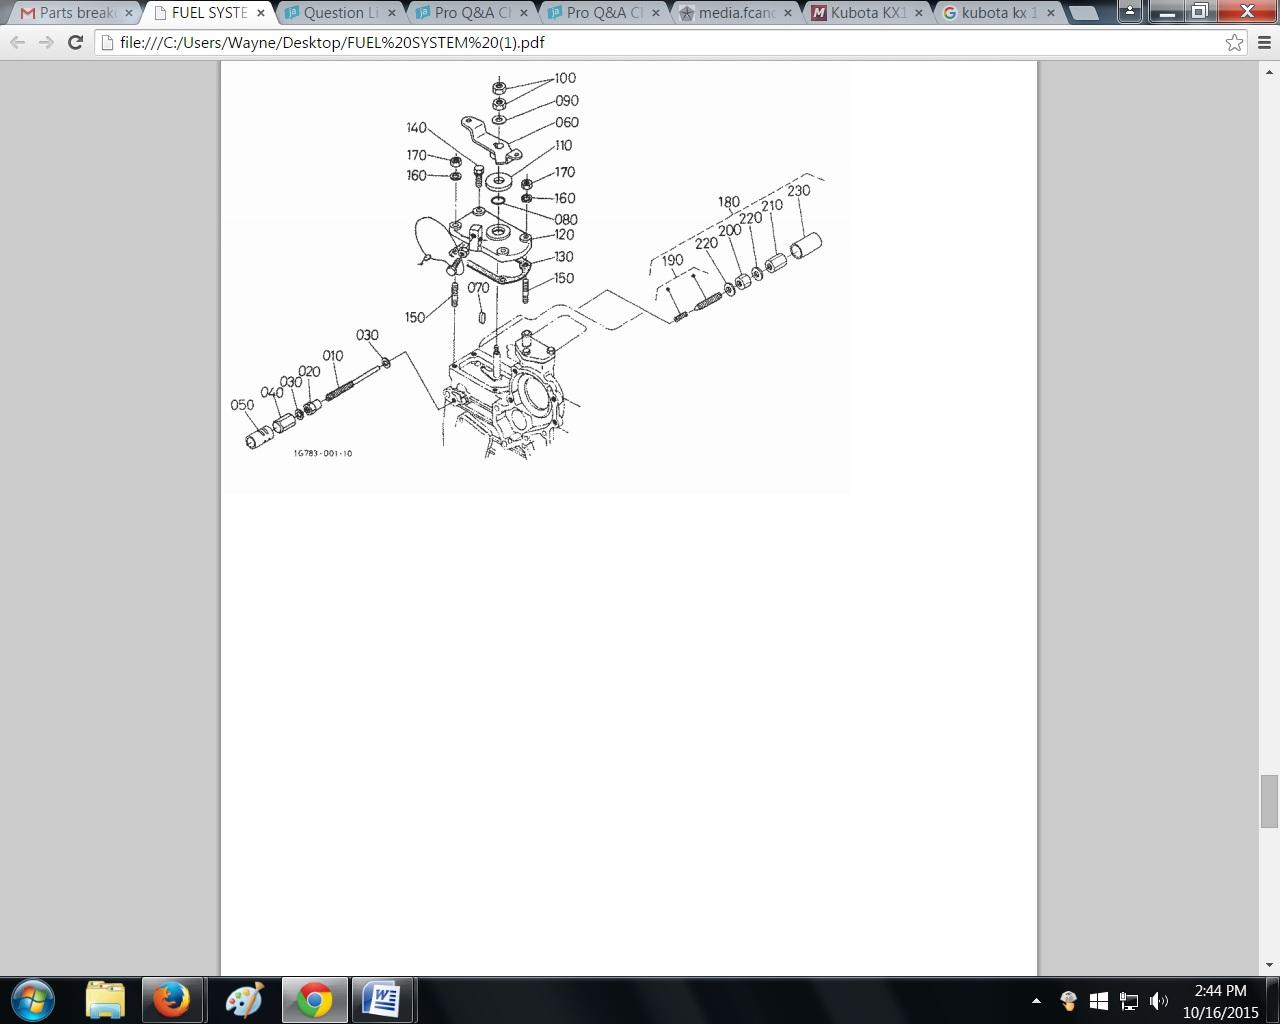 I have a kx123-3 super Kubota excavator the idle control is